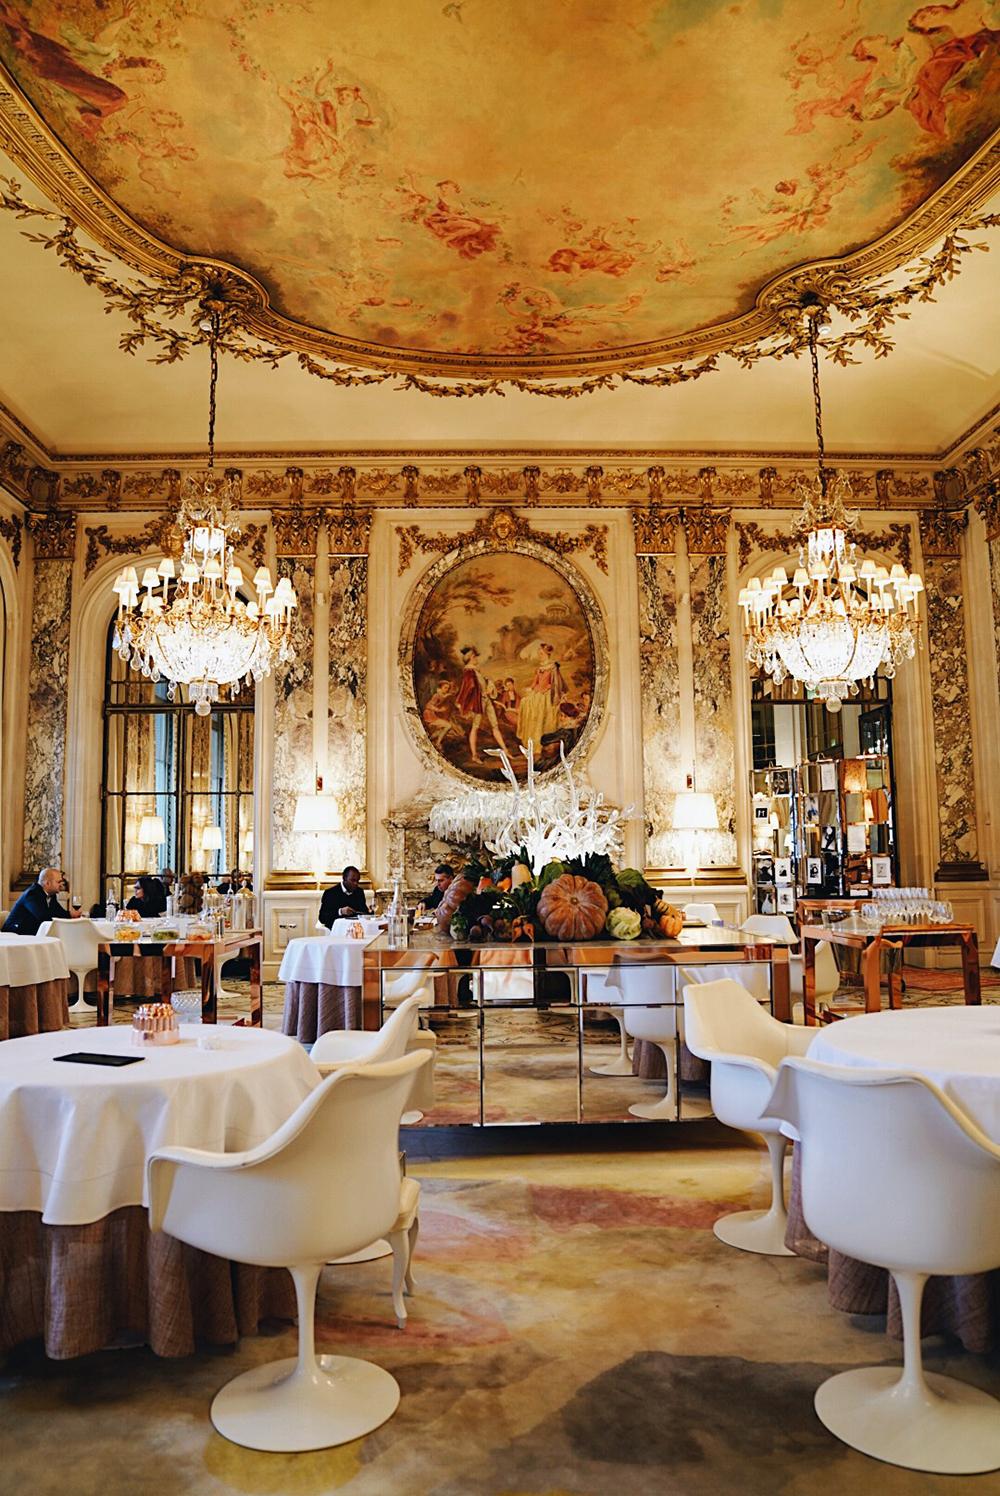 Lunch at  Restaurant Le Meurice Alain Ducasse